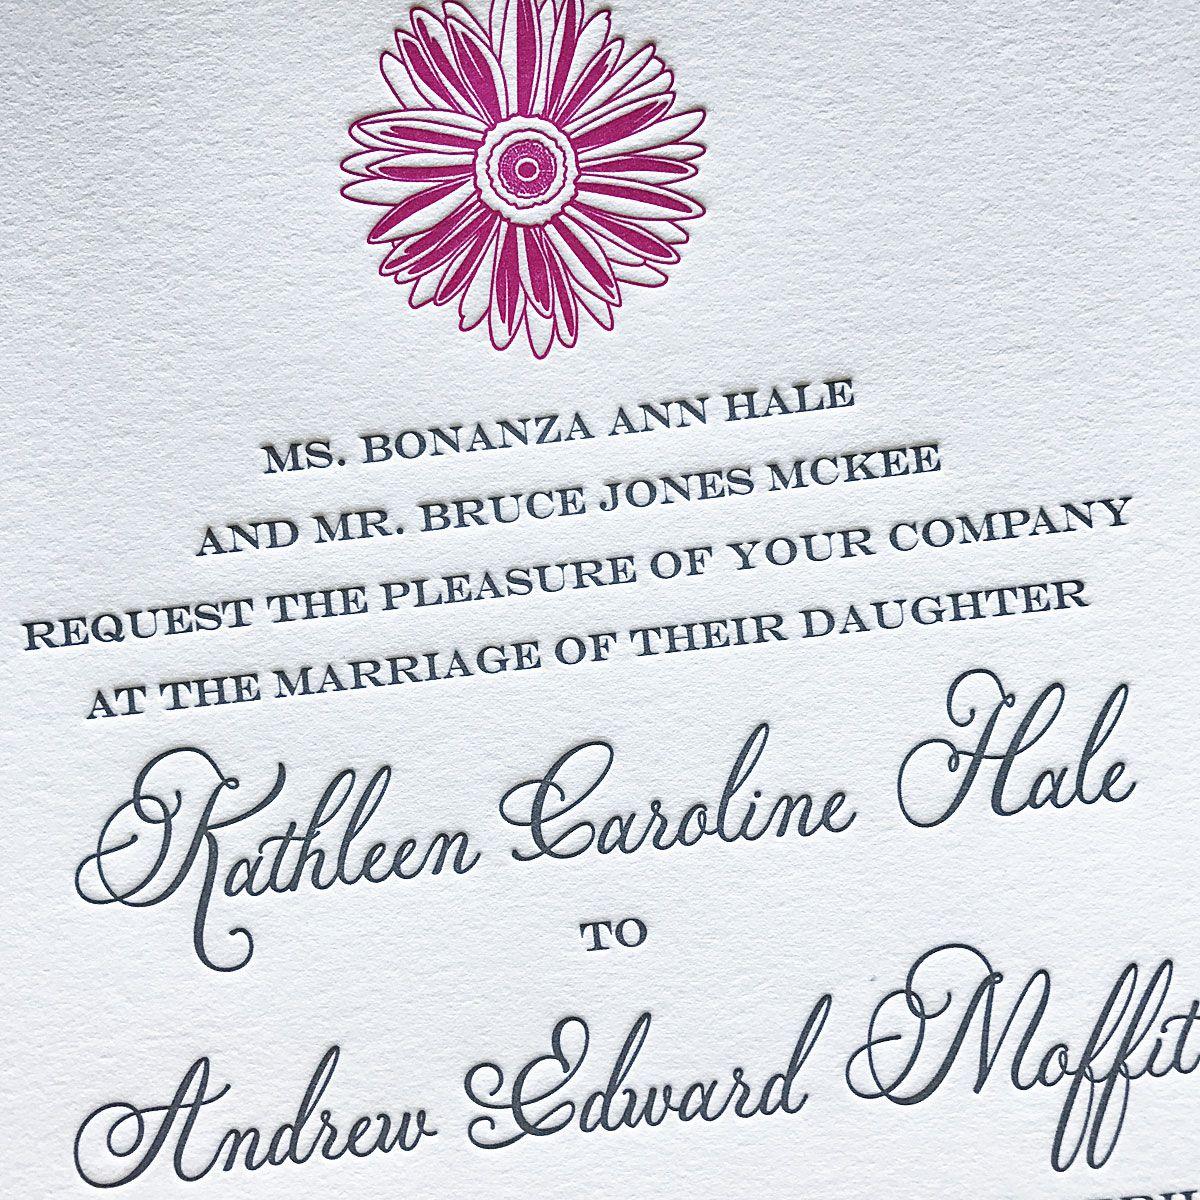 custom letterpress wedding invitations affordable letterpress invitations mospens studio - Affordable Letterpress Wedding Invitations